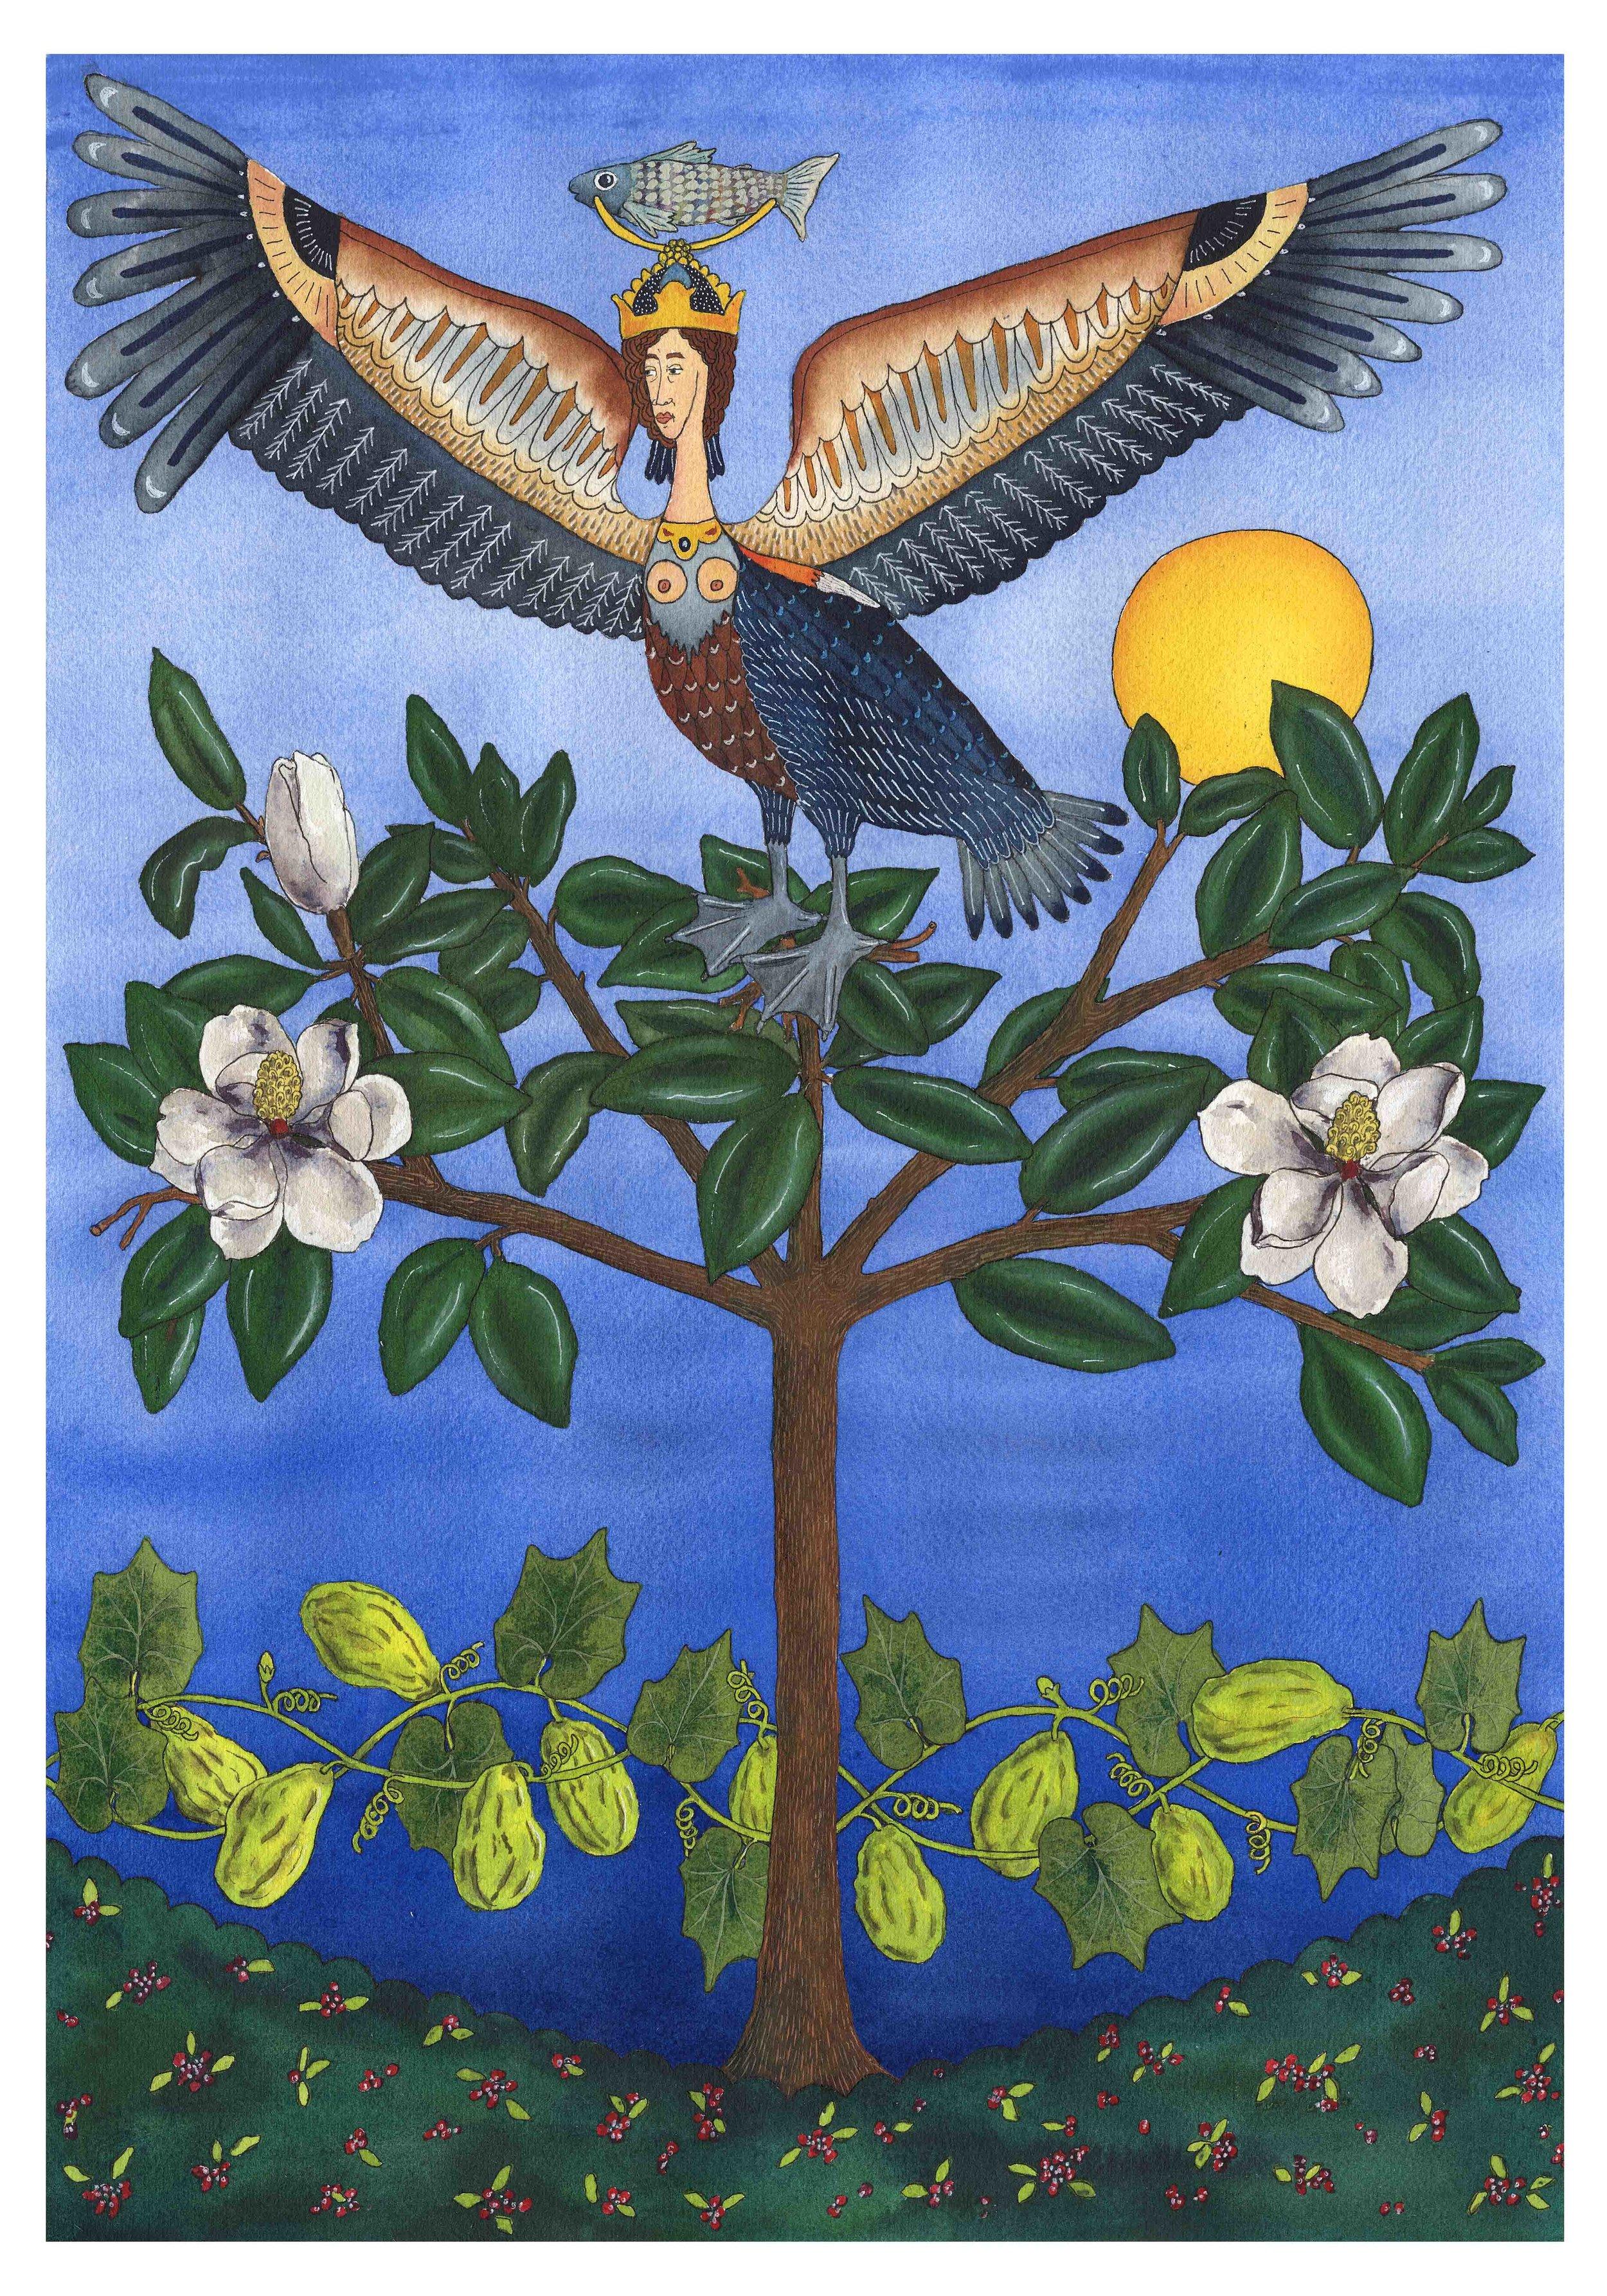 Louisiana Mythology Brown Pelican Alkonost Emma Fick Art